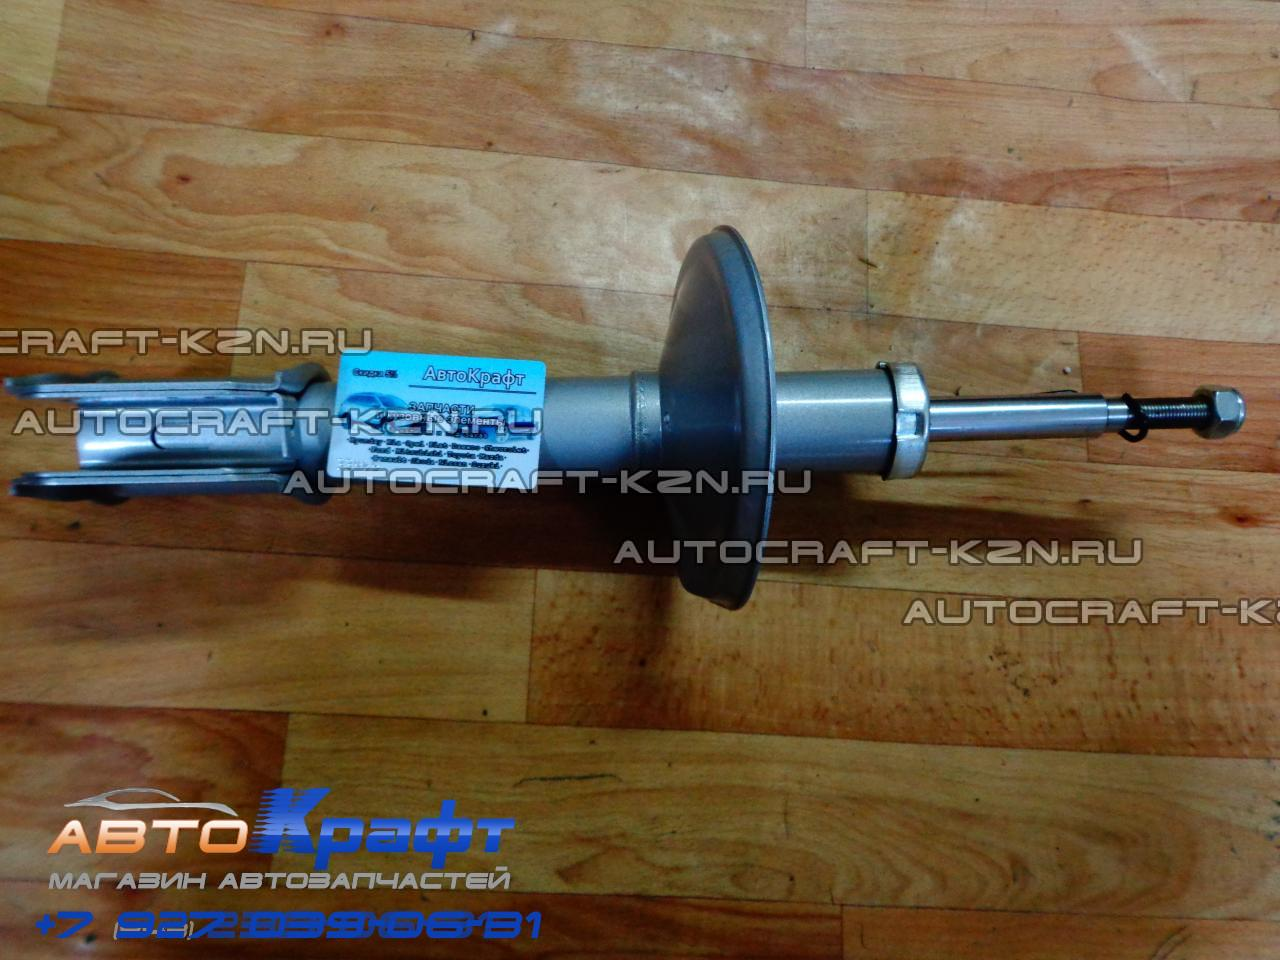 Амортизатор передний Renault Sandero 6001550751| Автозапчасти ...